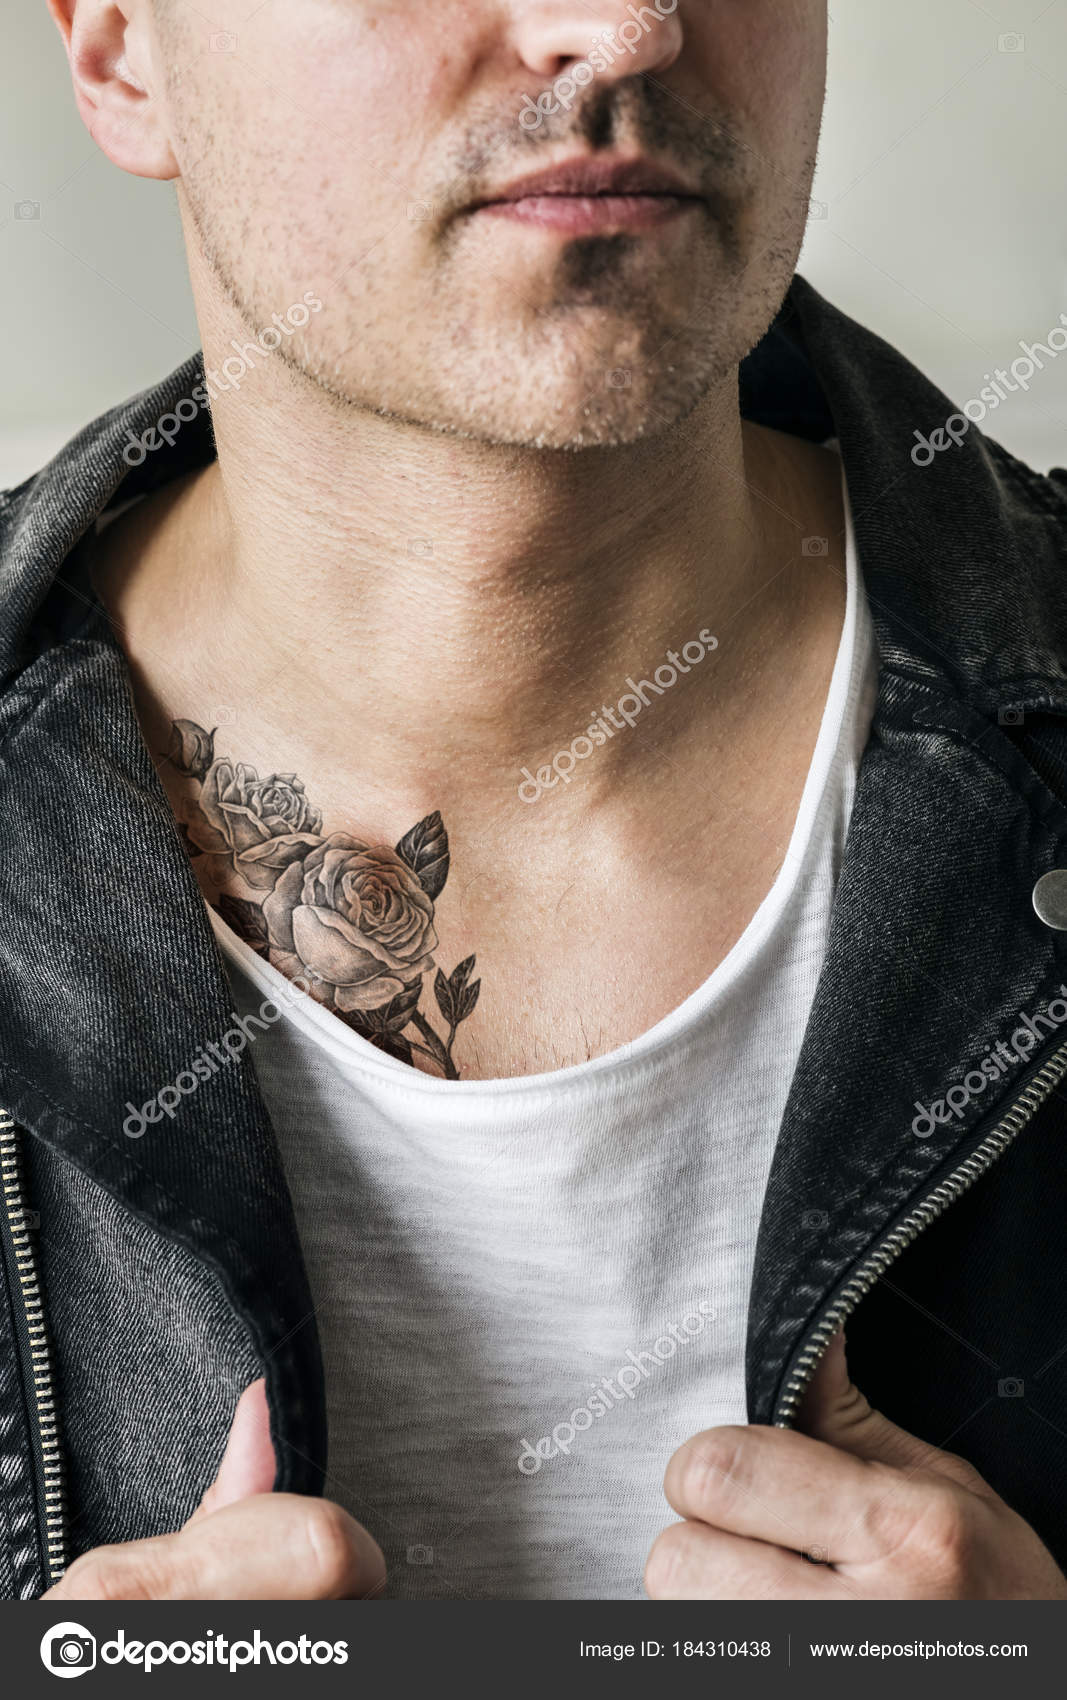 Cierre Para Arriba Del Tatuaje Pecho Hombre Fotos De Stock